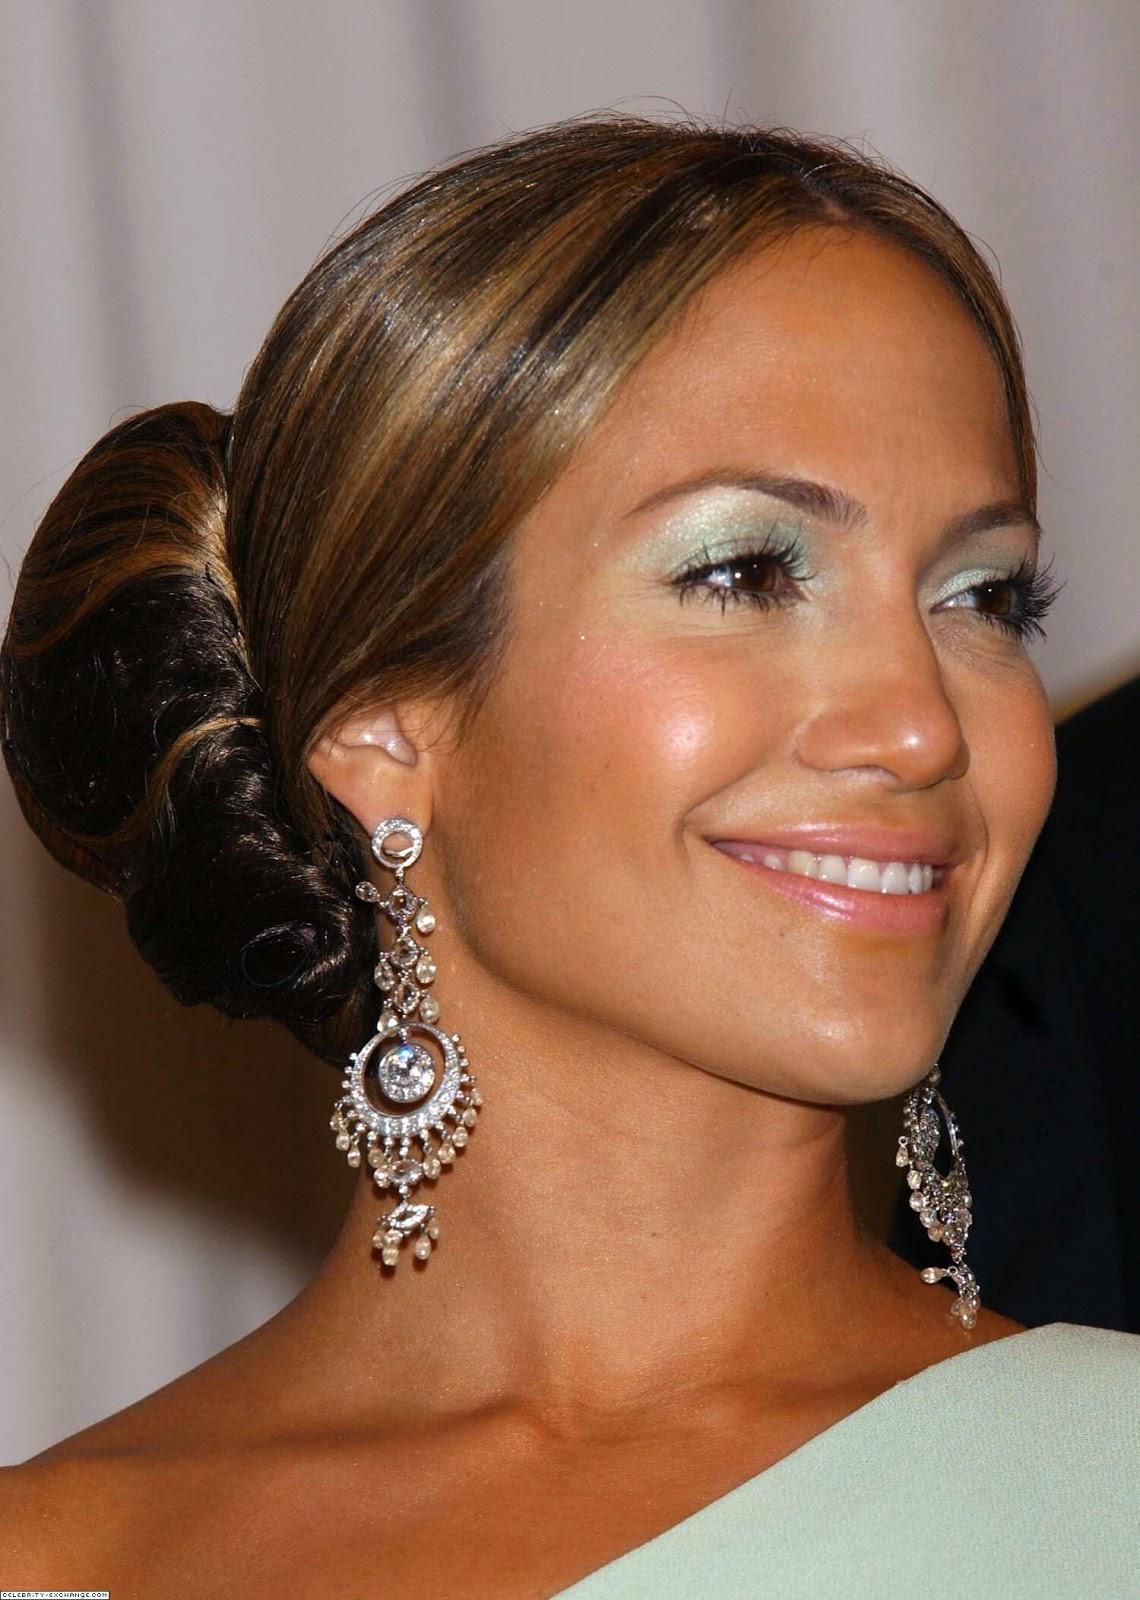 Peinados Jennifer Lopez - Peinado de Jennifer Lopez YouTube